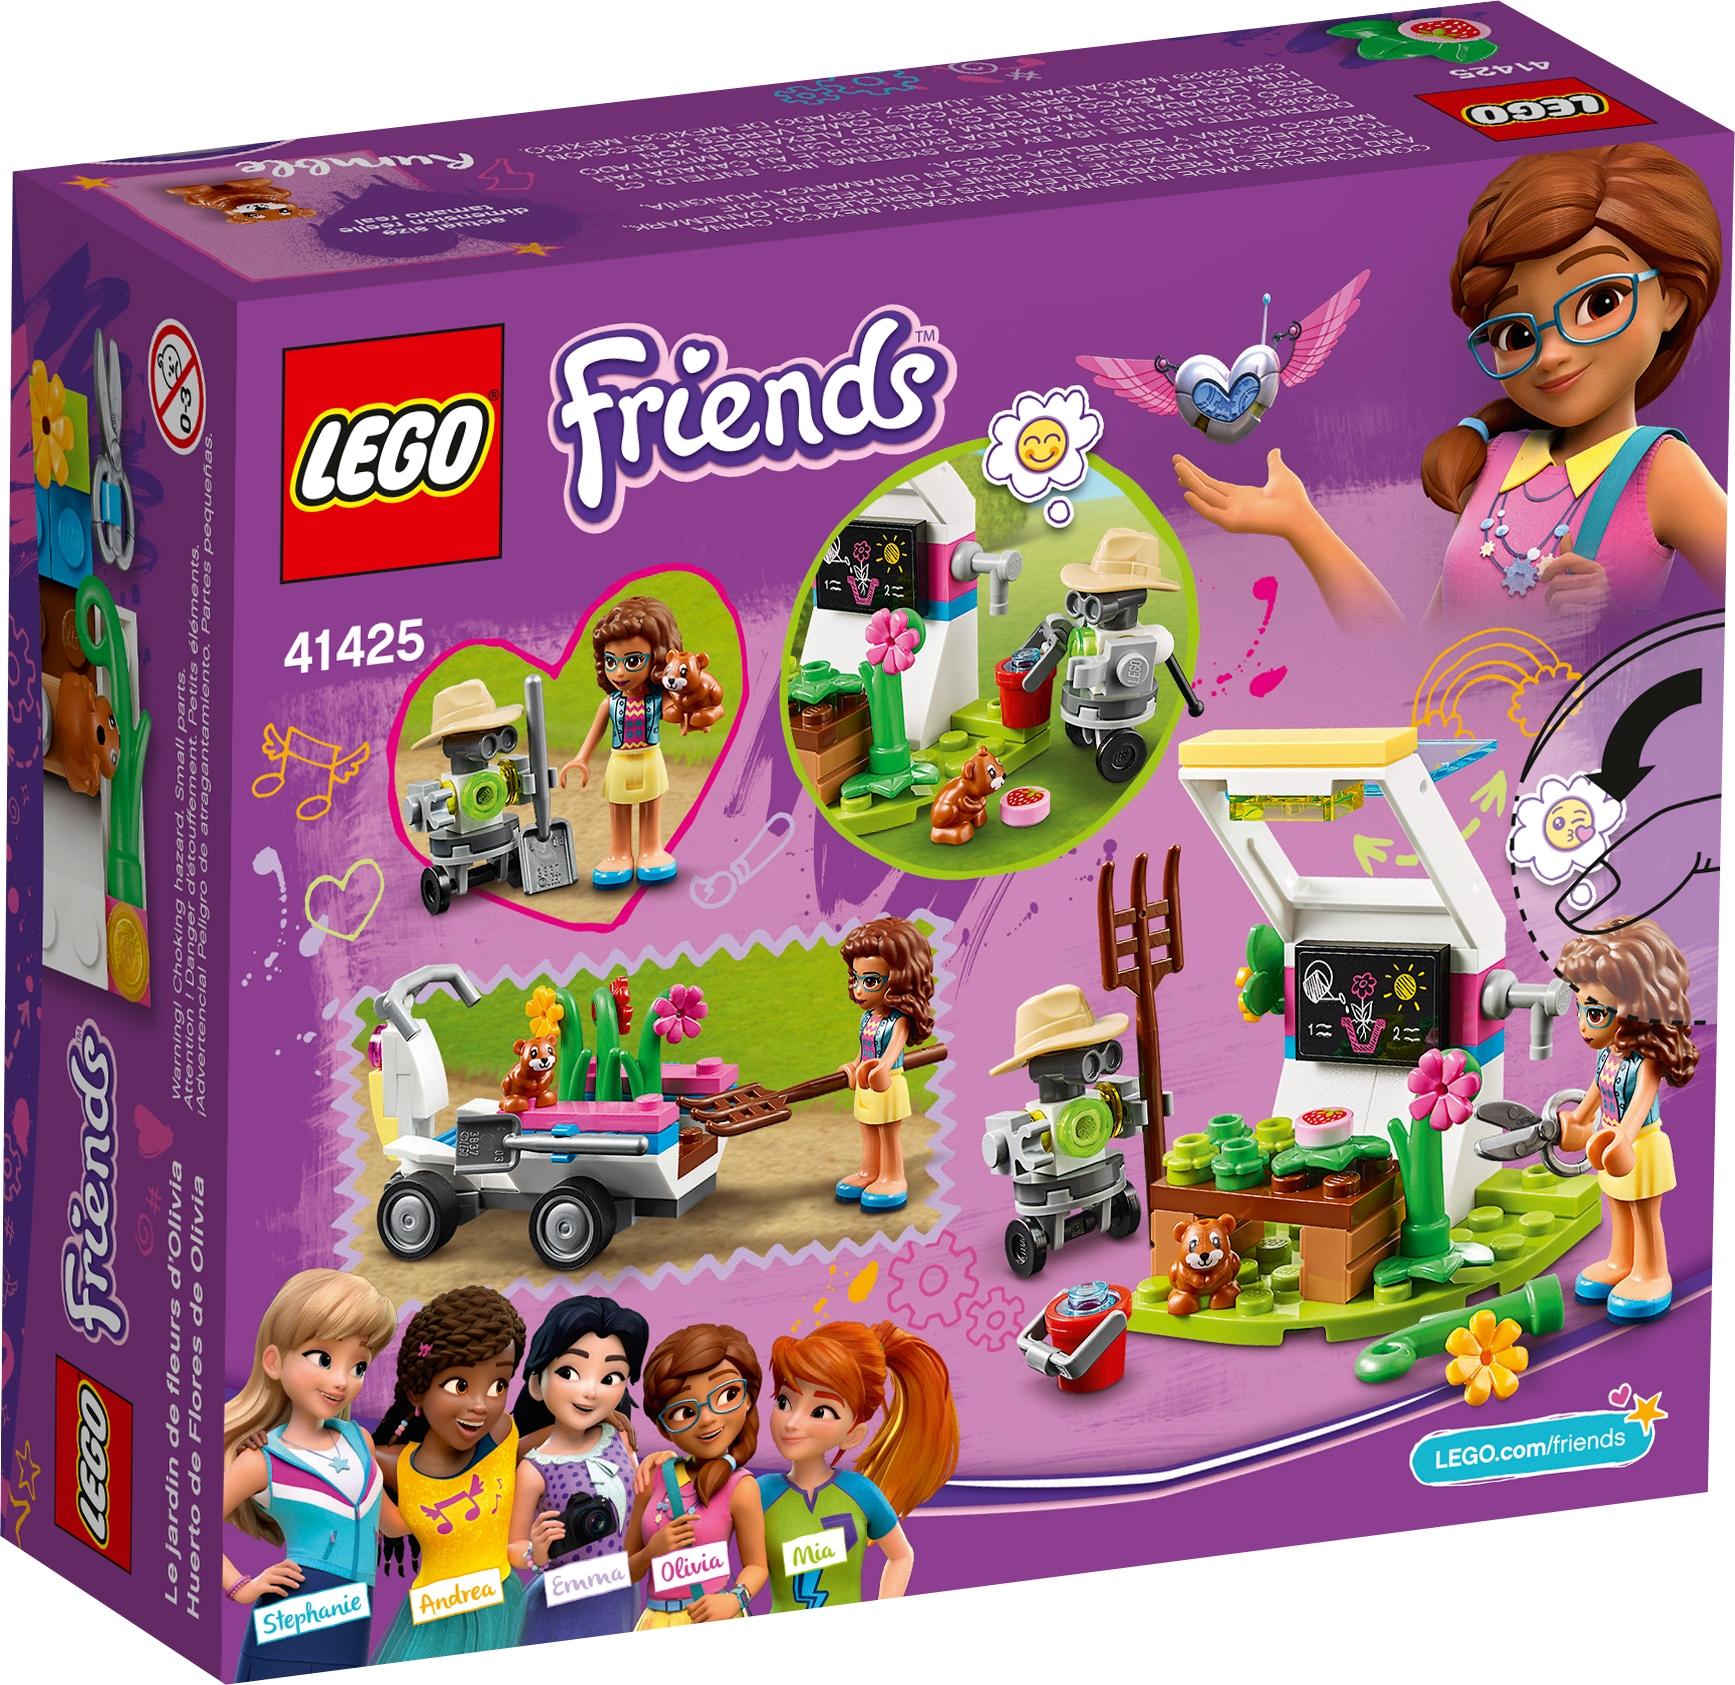 LEGO FRIENDS Olivia/'s Flower Garden 41425 Set